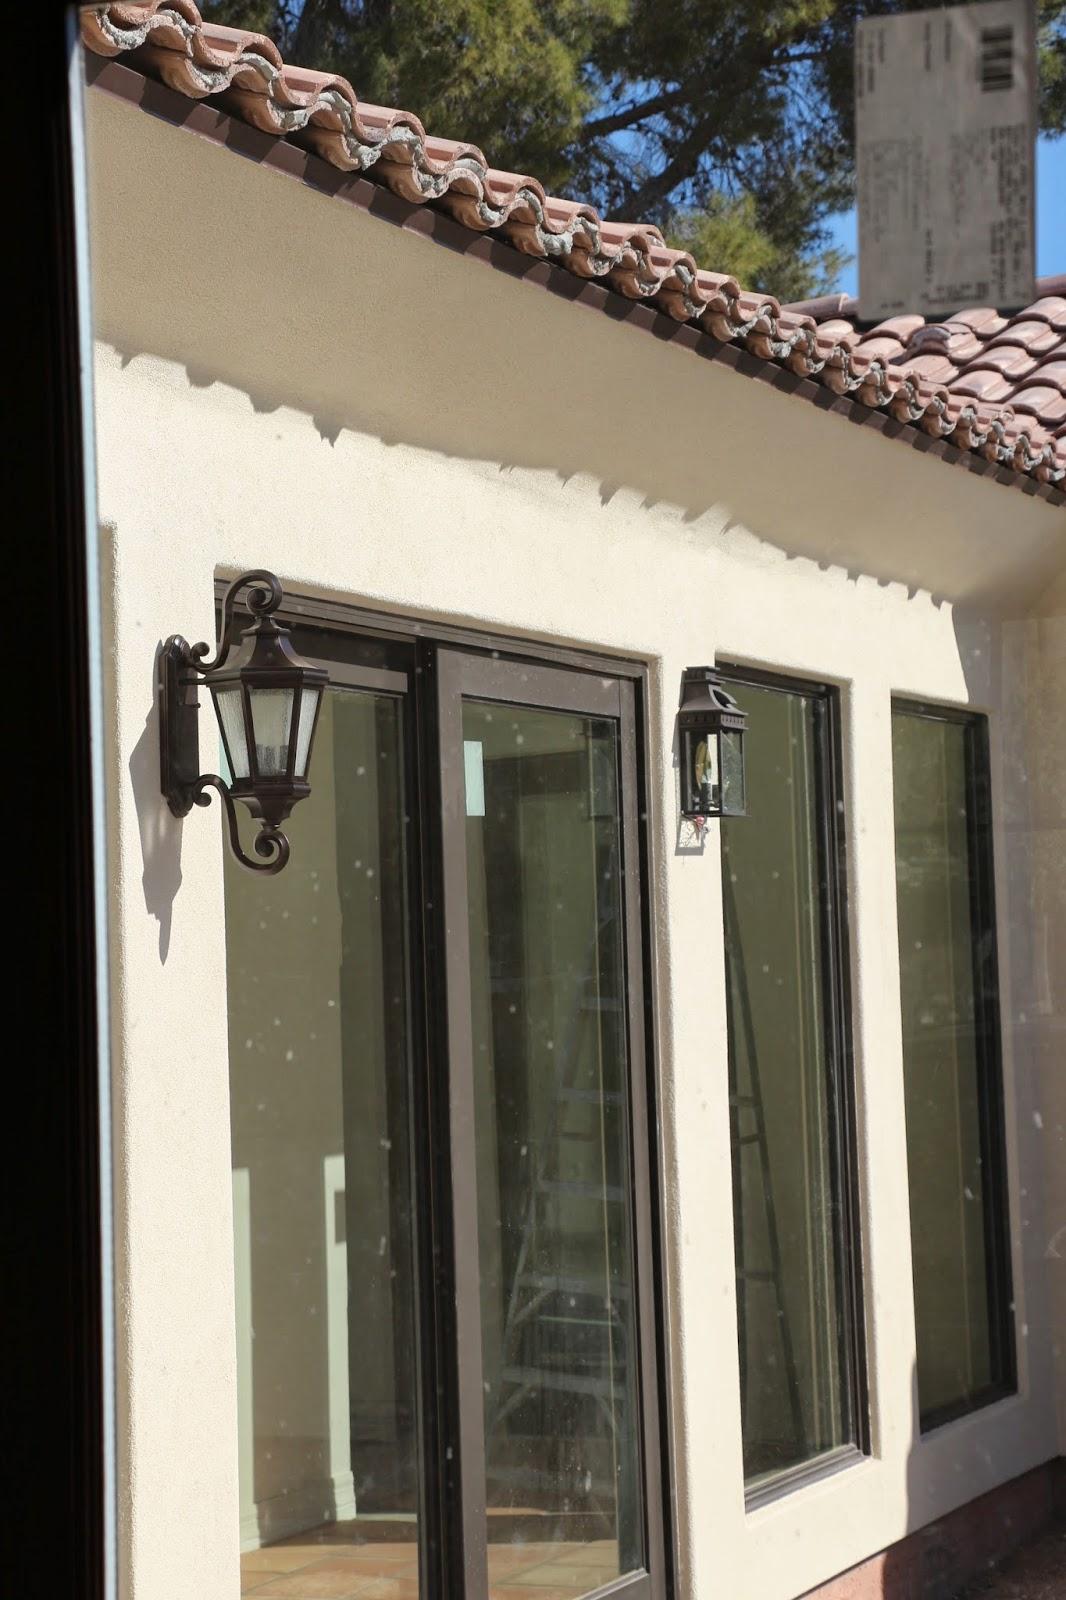 calvin crest wall light, portfolio bulow wall light